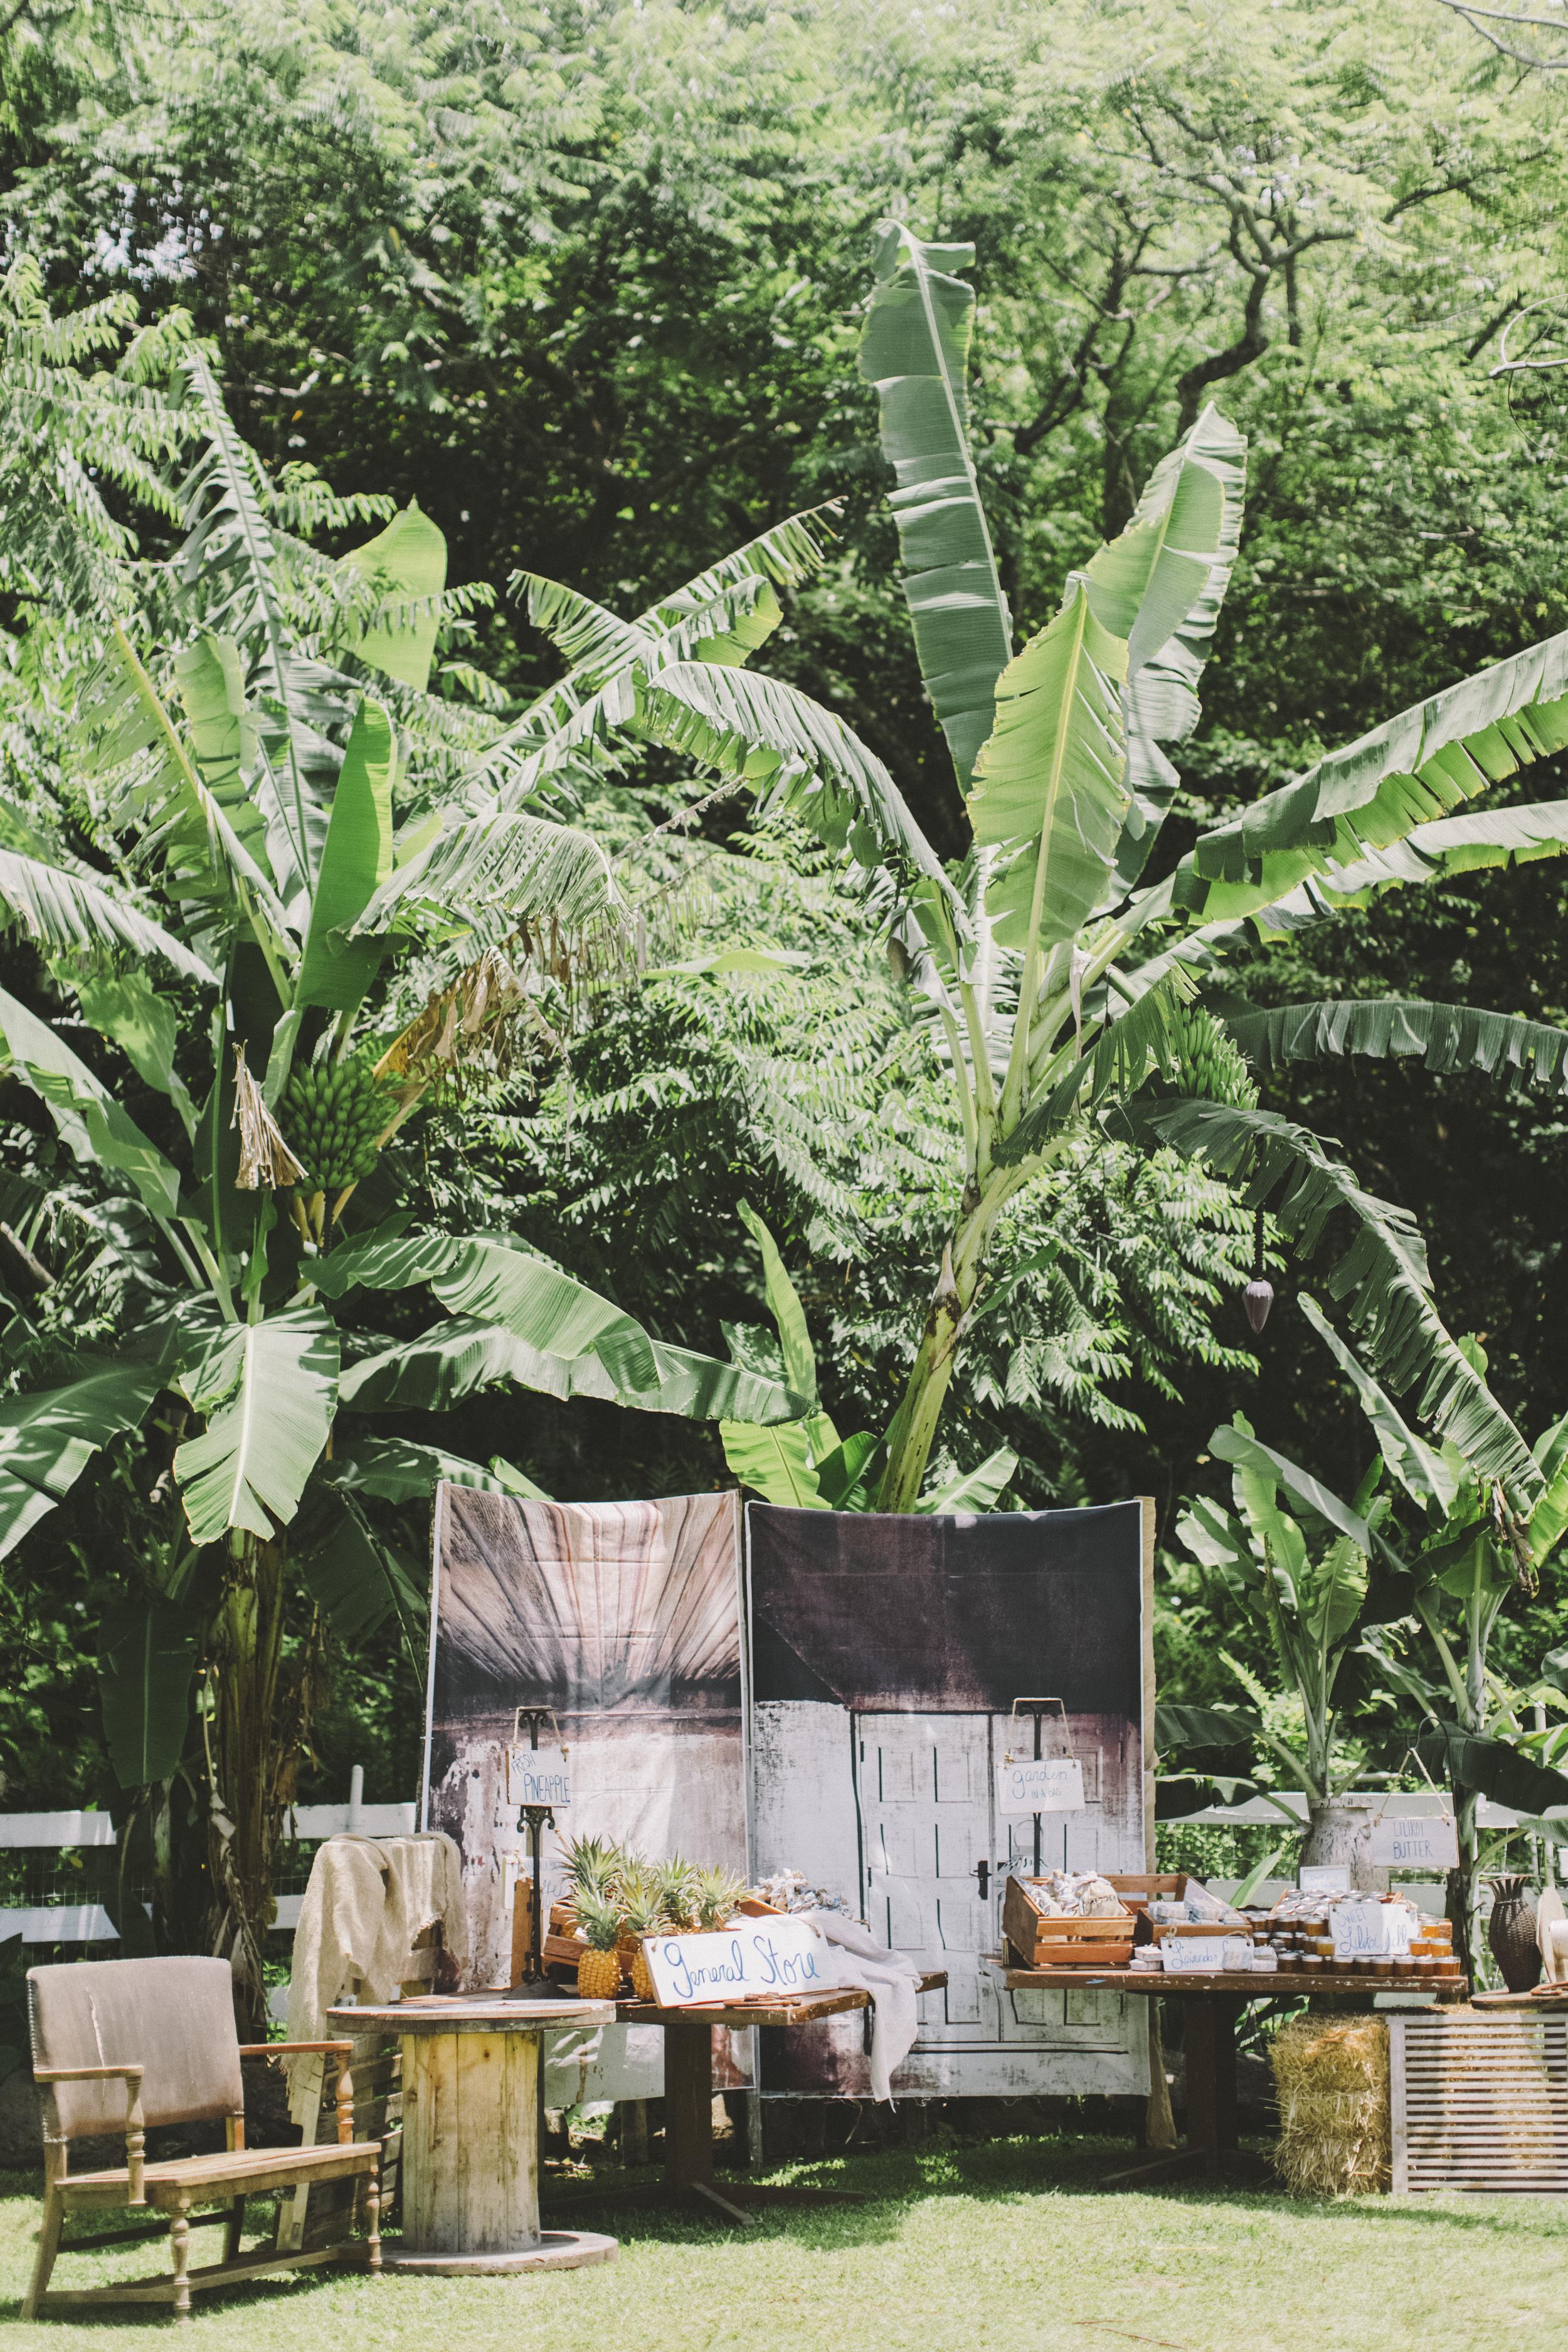 angie-diaz-photography-oahu-hawaii-wedding-tradewinds-ranch-92.jpg